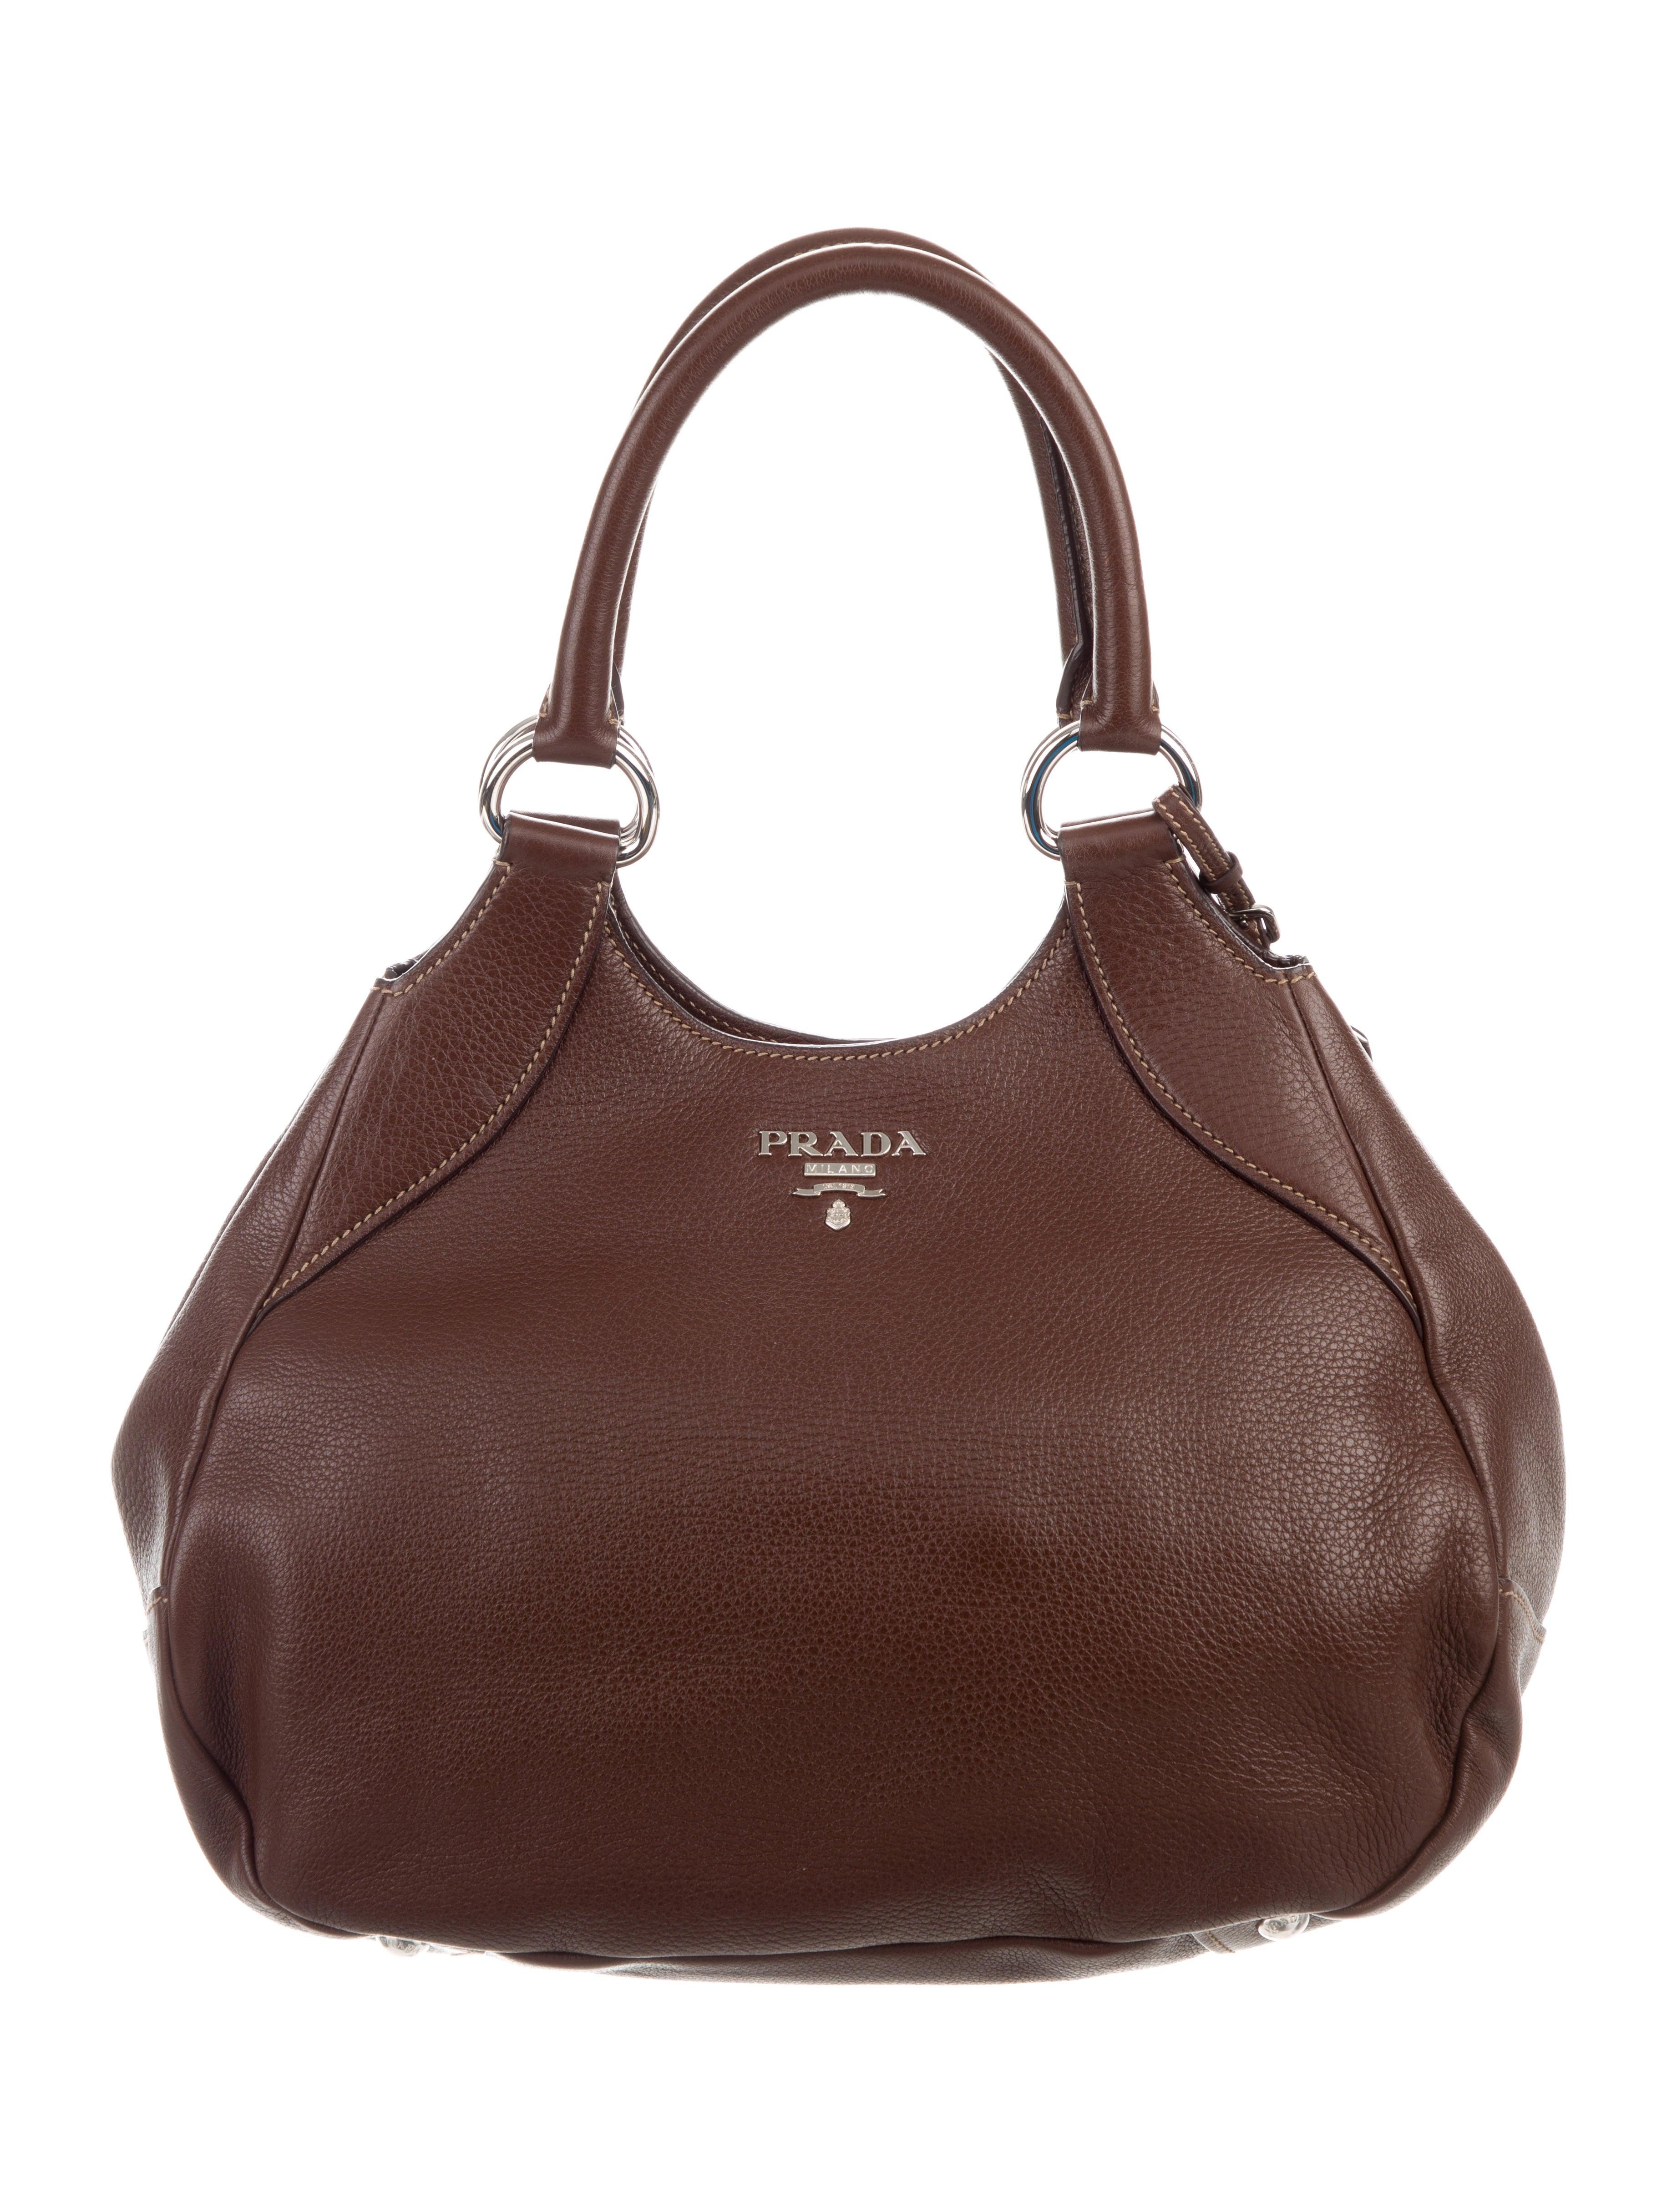 4fe641a1d542 Prada Vitello Daino Shoulder Bag - Handbags - PRA273579